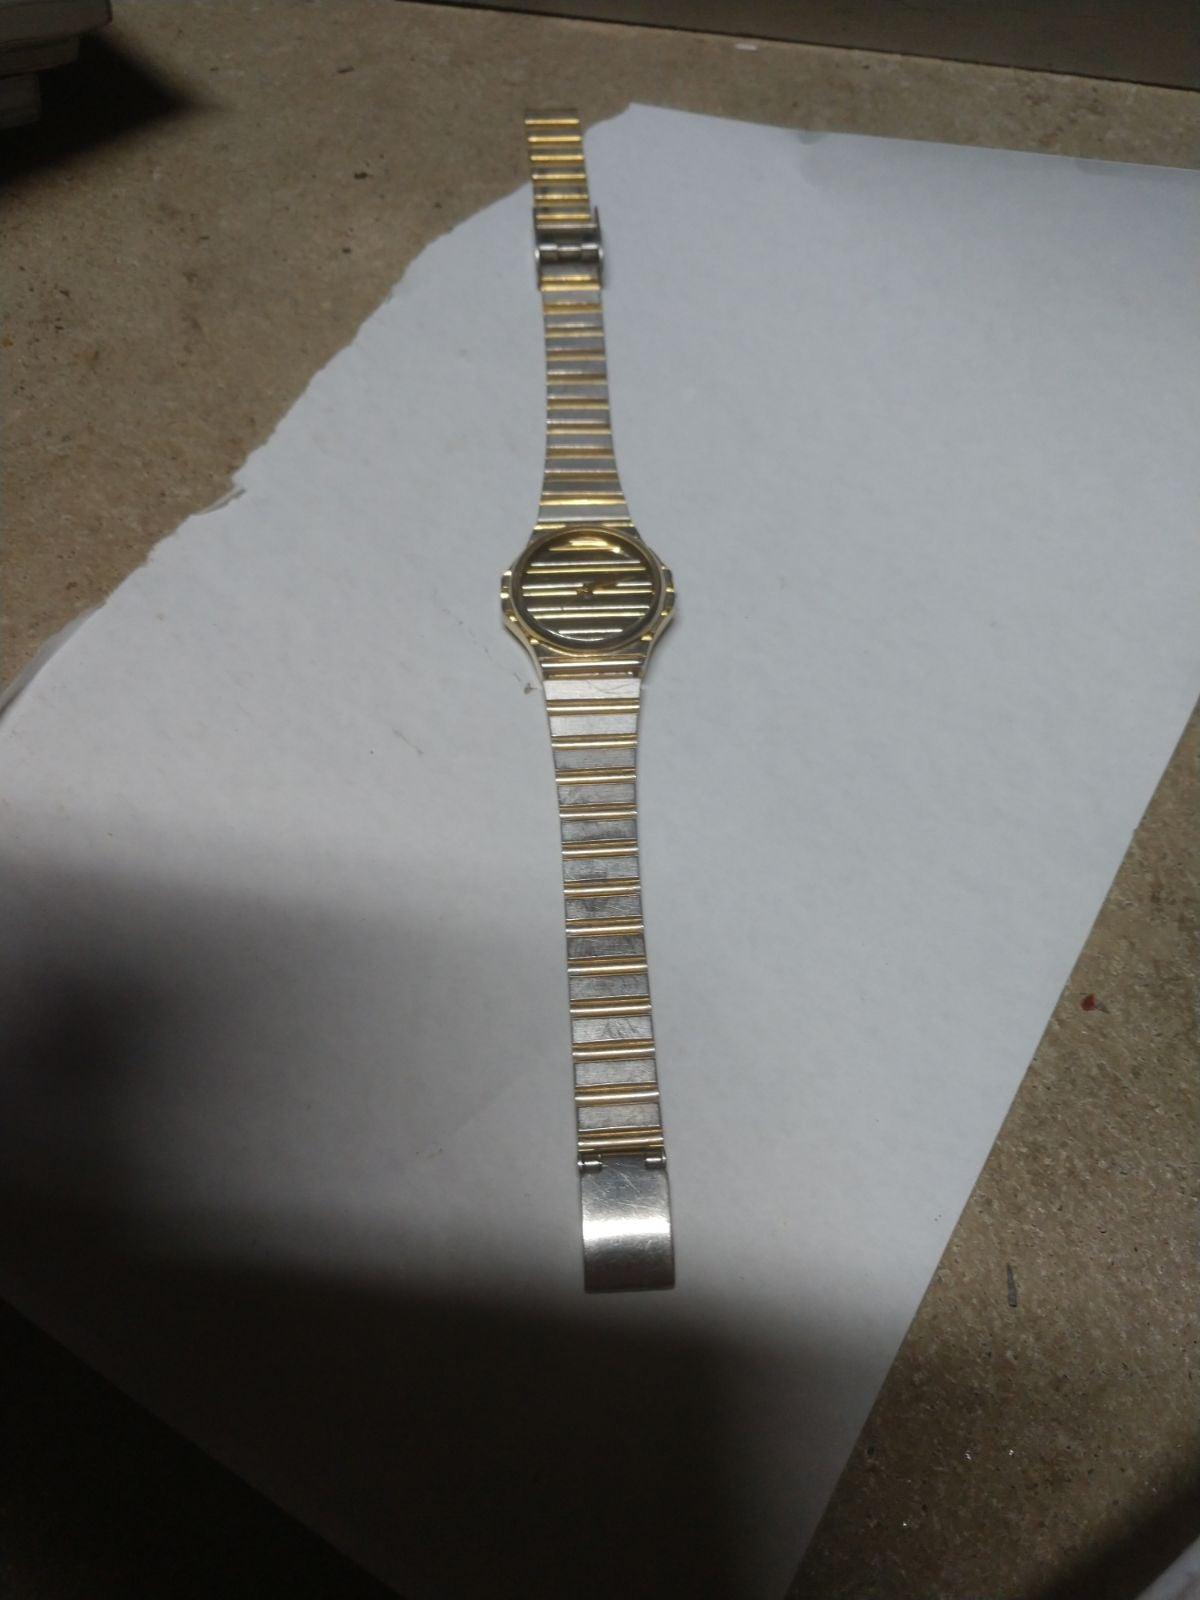 Piaget Vintage Women's Two Tone Watch